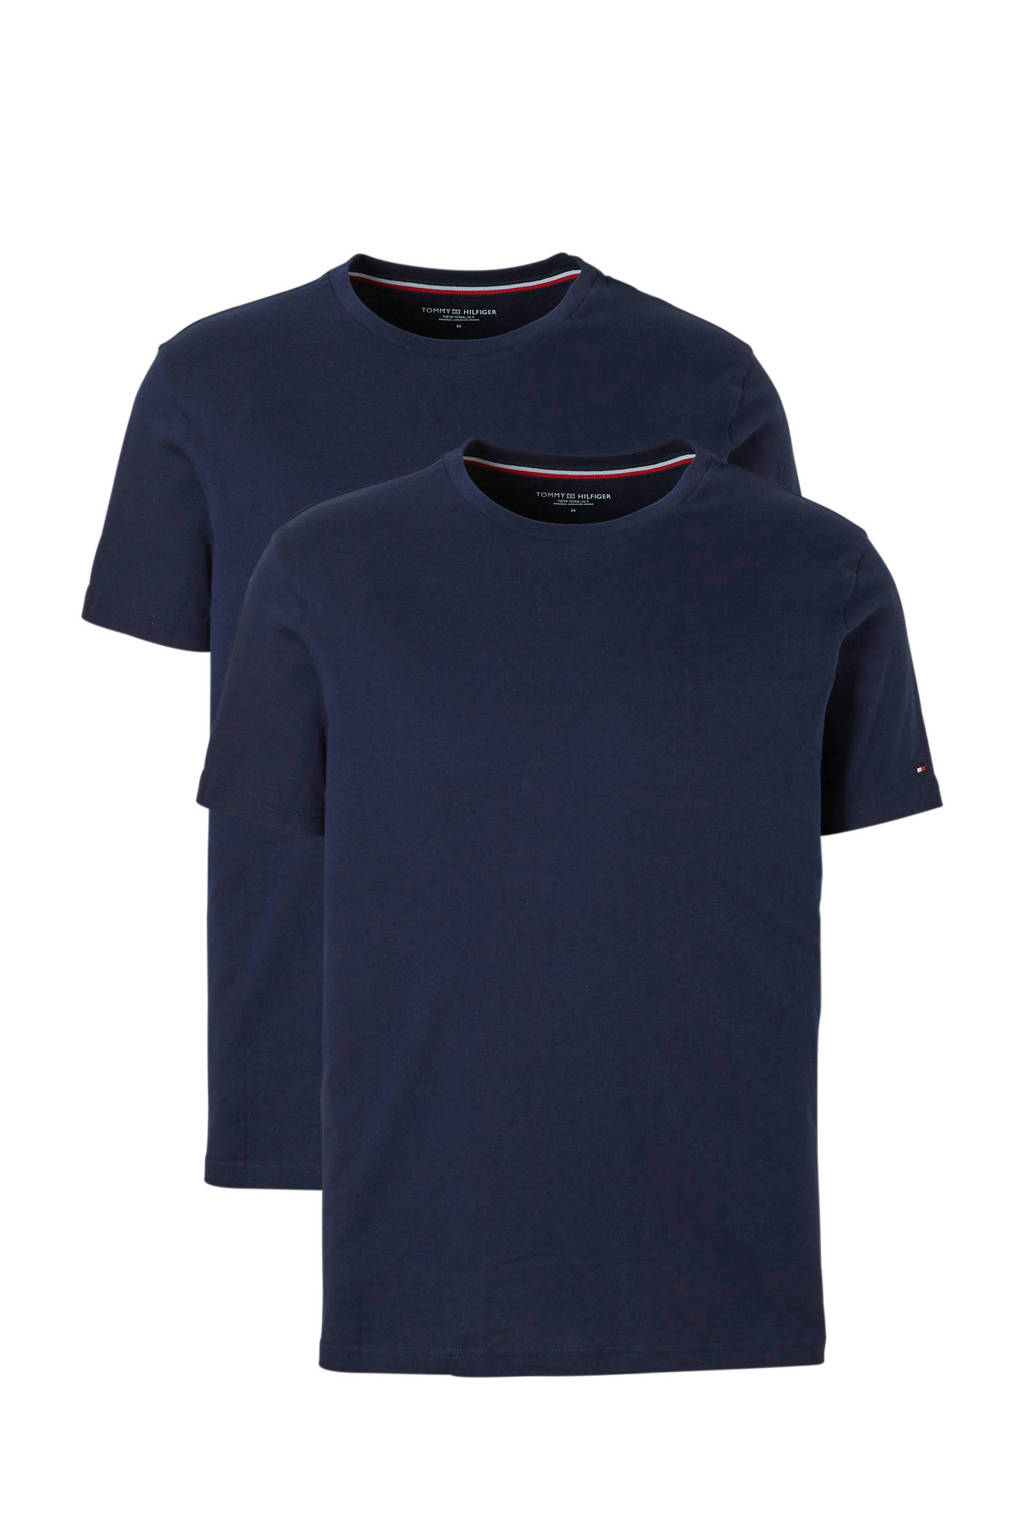 Tommy Hilfiger T-shirt (set van 2) zwart, Donker blauw